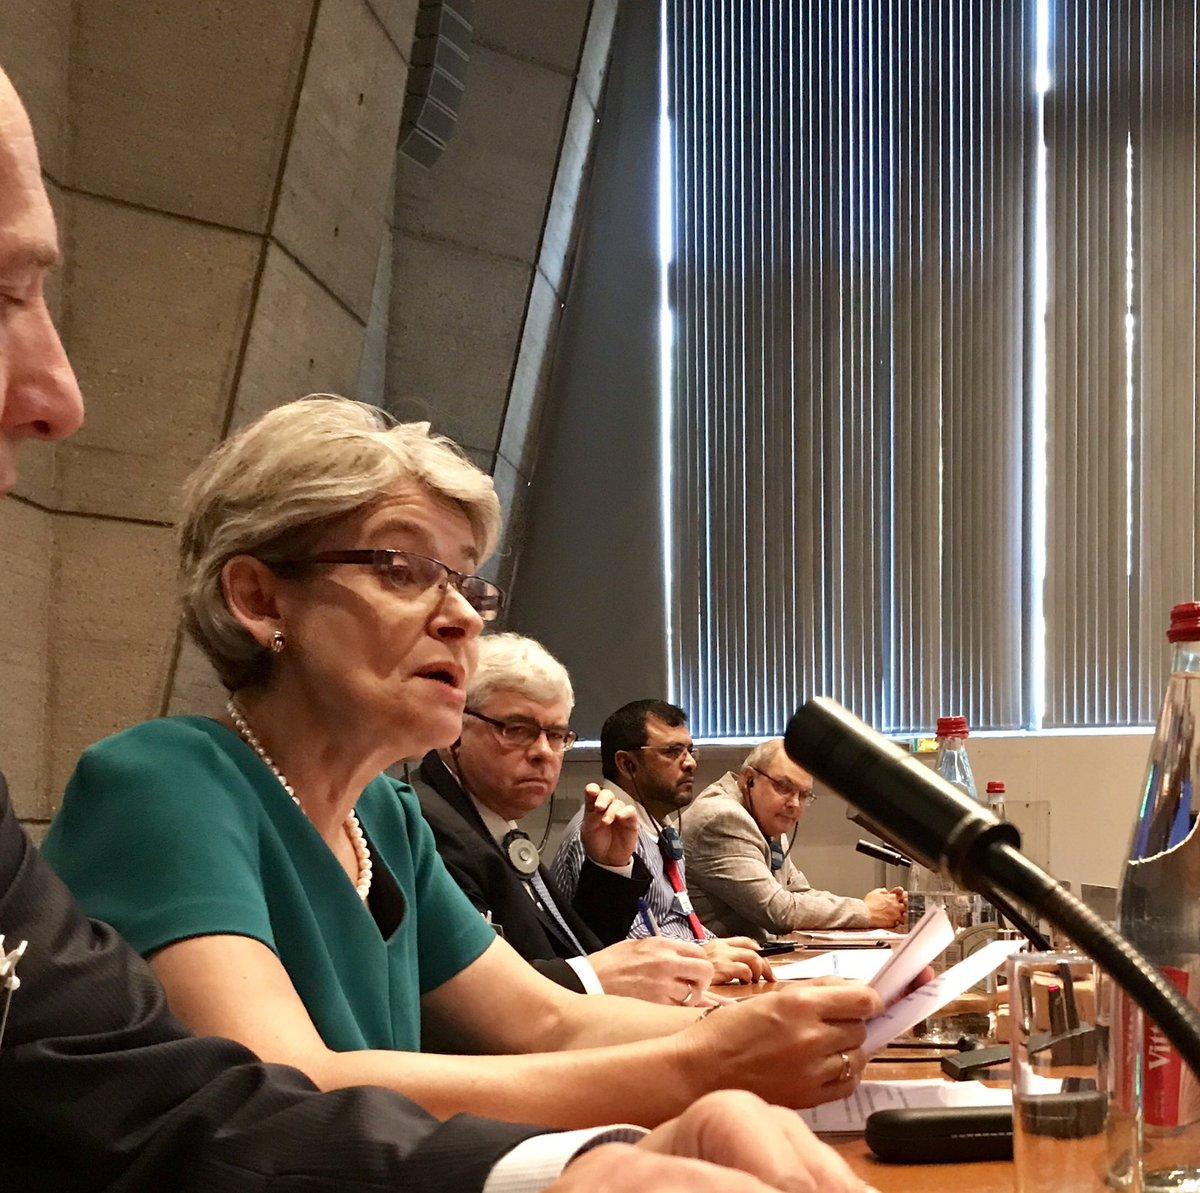 DG @unesco @IrinaBokova welcomes delegates to @IocUnesco #IOC29, mentions key role of IOC in #SDG14 #COP21, capacity building, tech transfer <br>http://pic.twitter.com/VpgVDkptIb